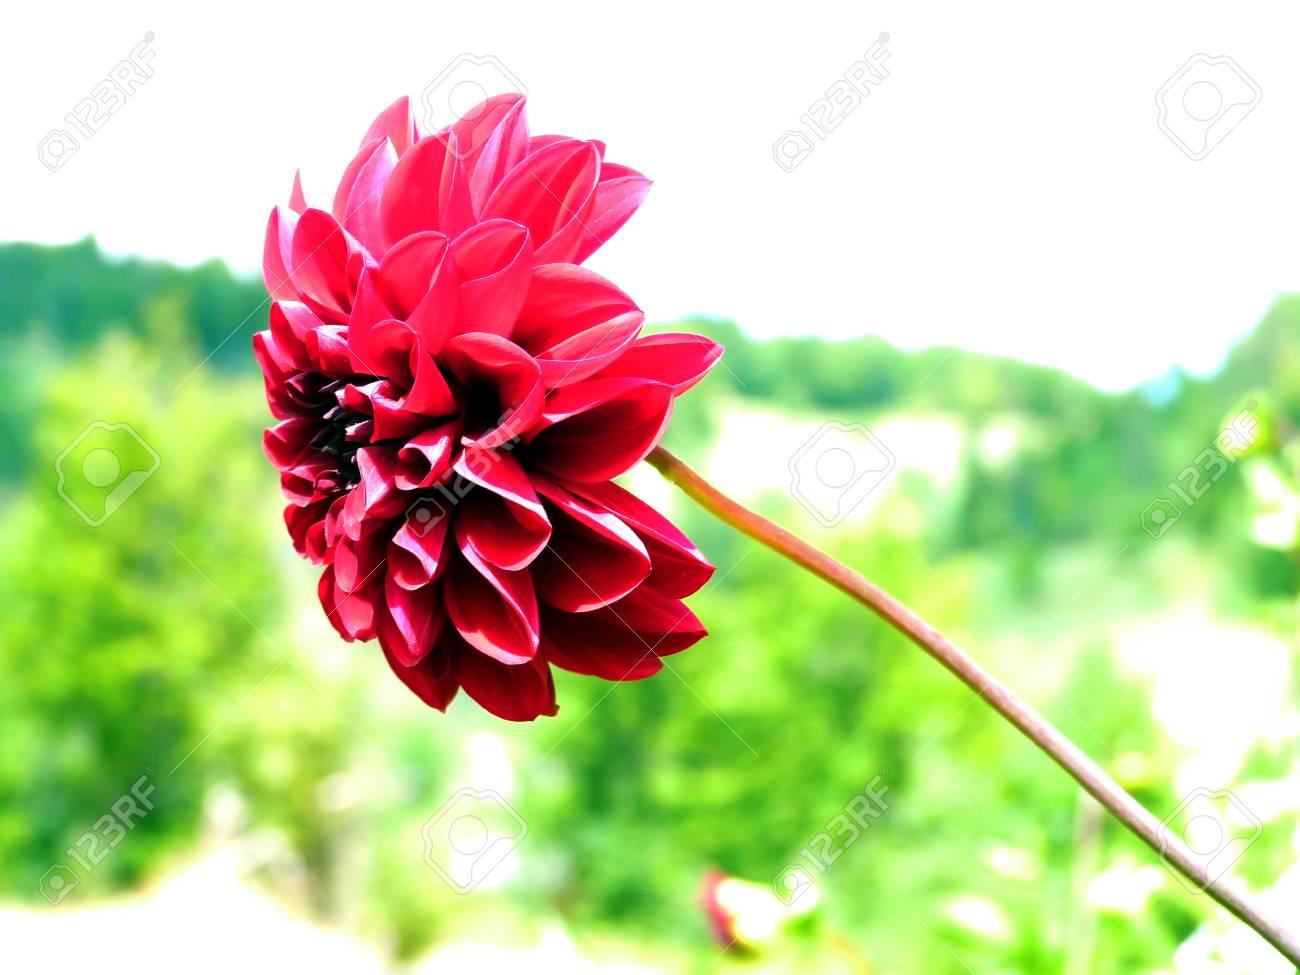 Flower with long stem - 86168330